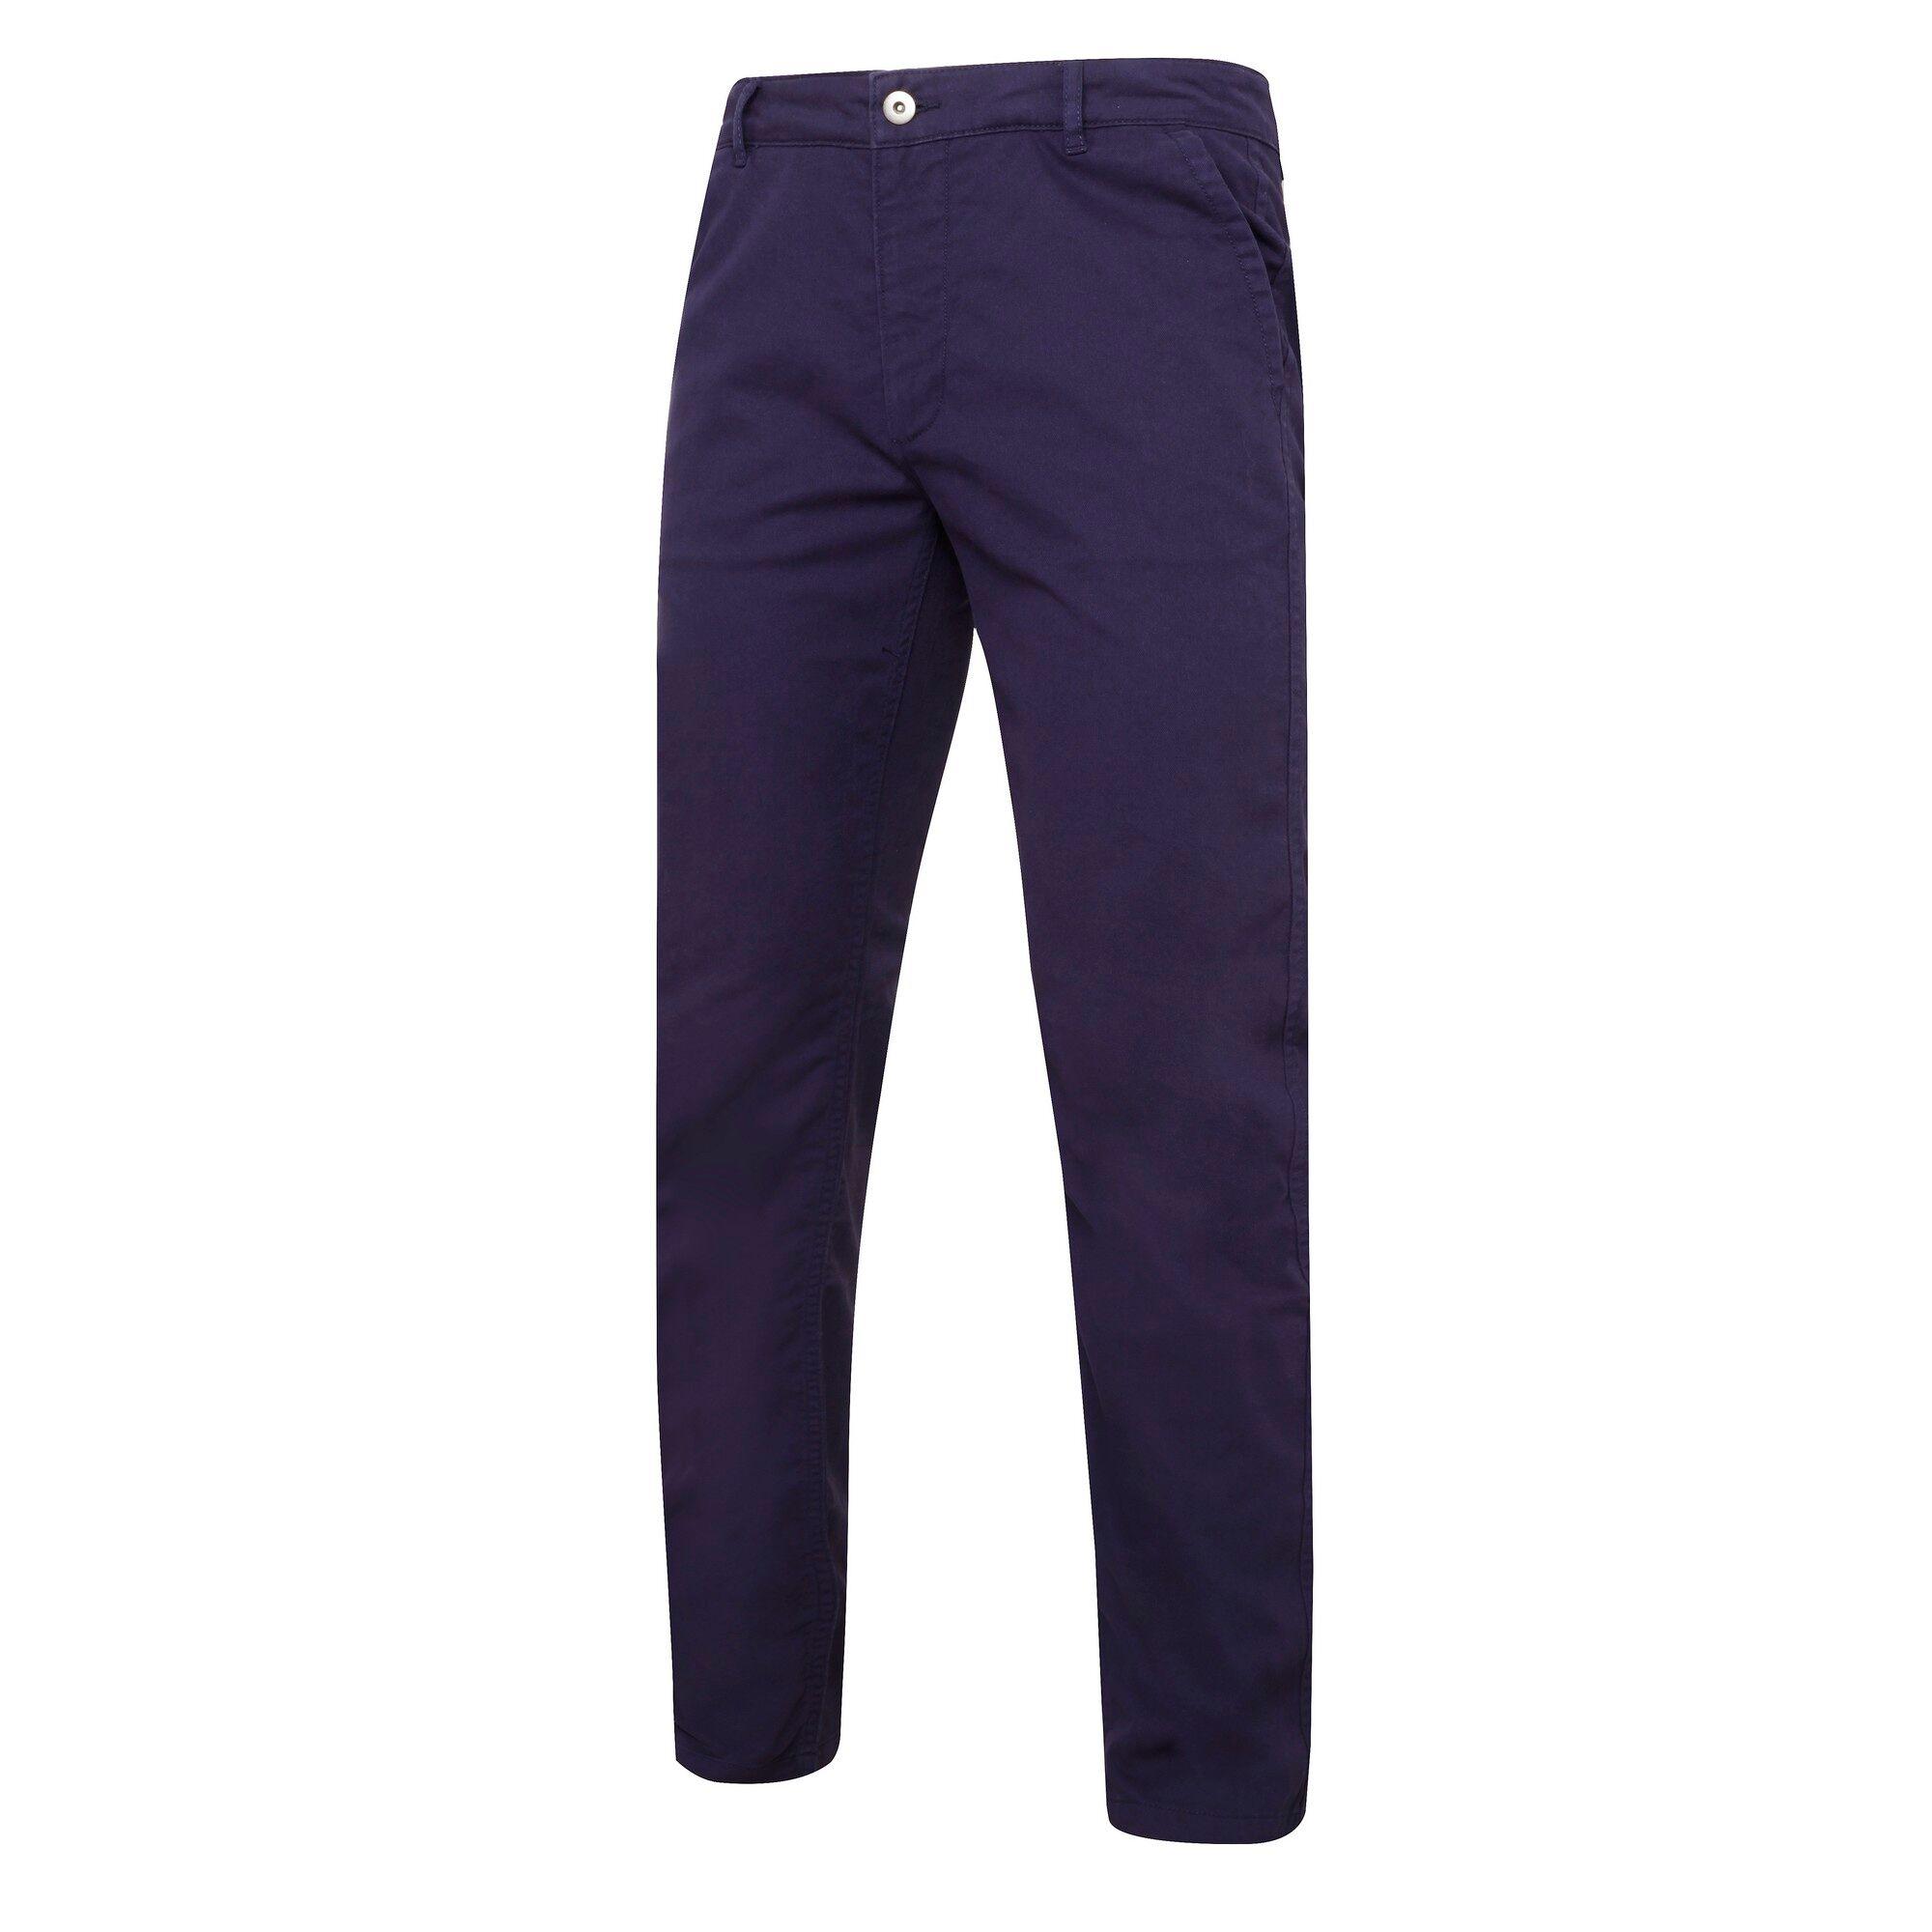 Asquith & Fox - Pantalon Chino En Coton (Coupe Ajustée) - Homme (Bleu marine) - UTRW5355